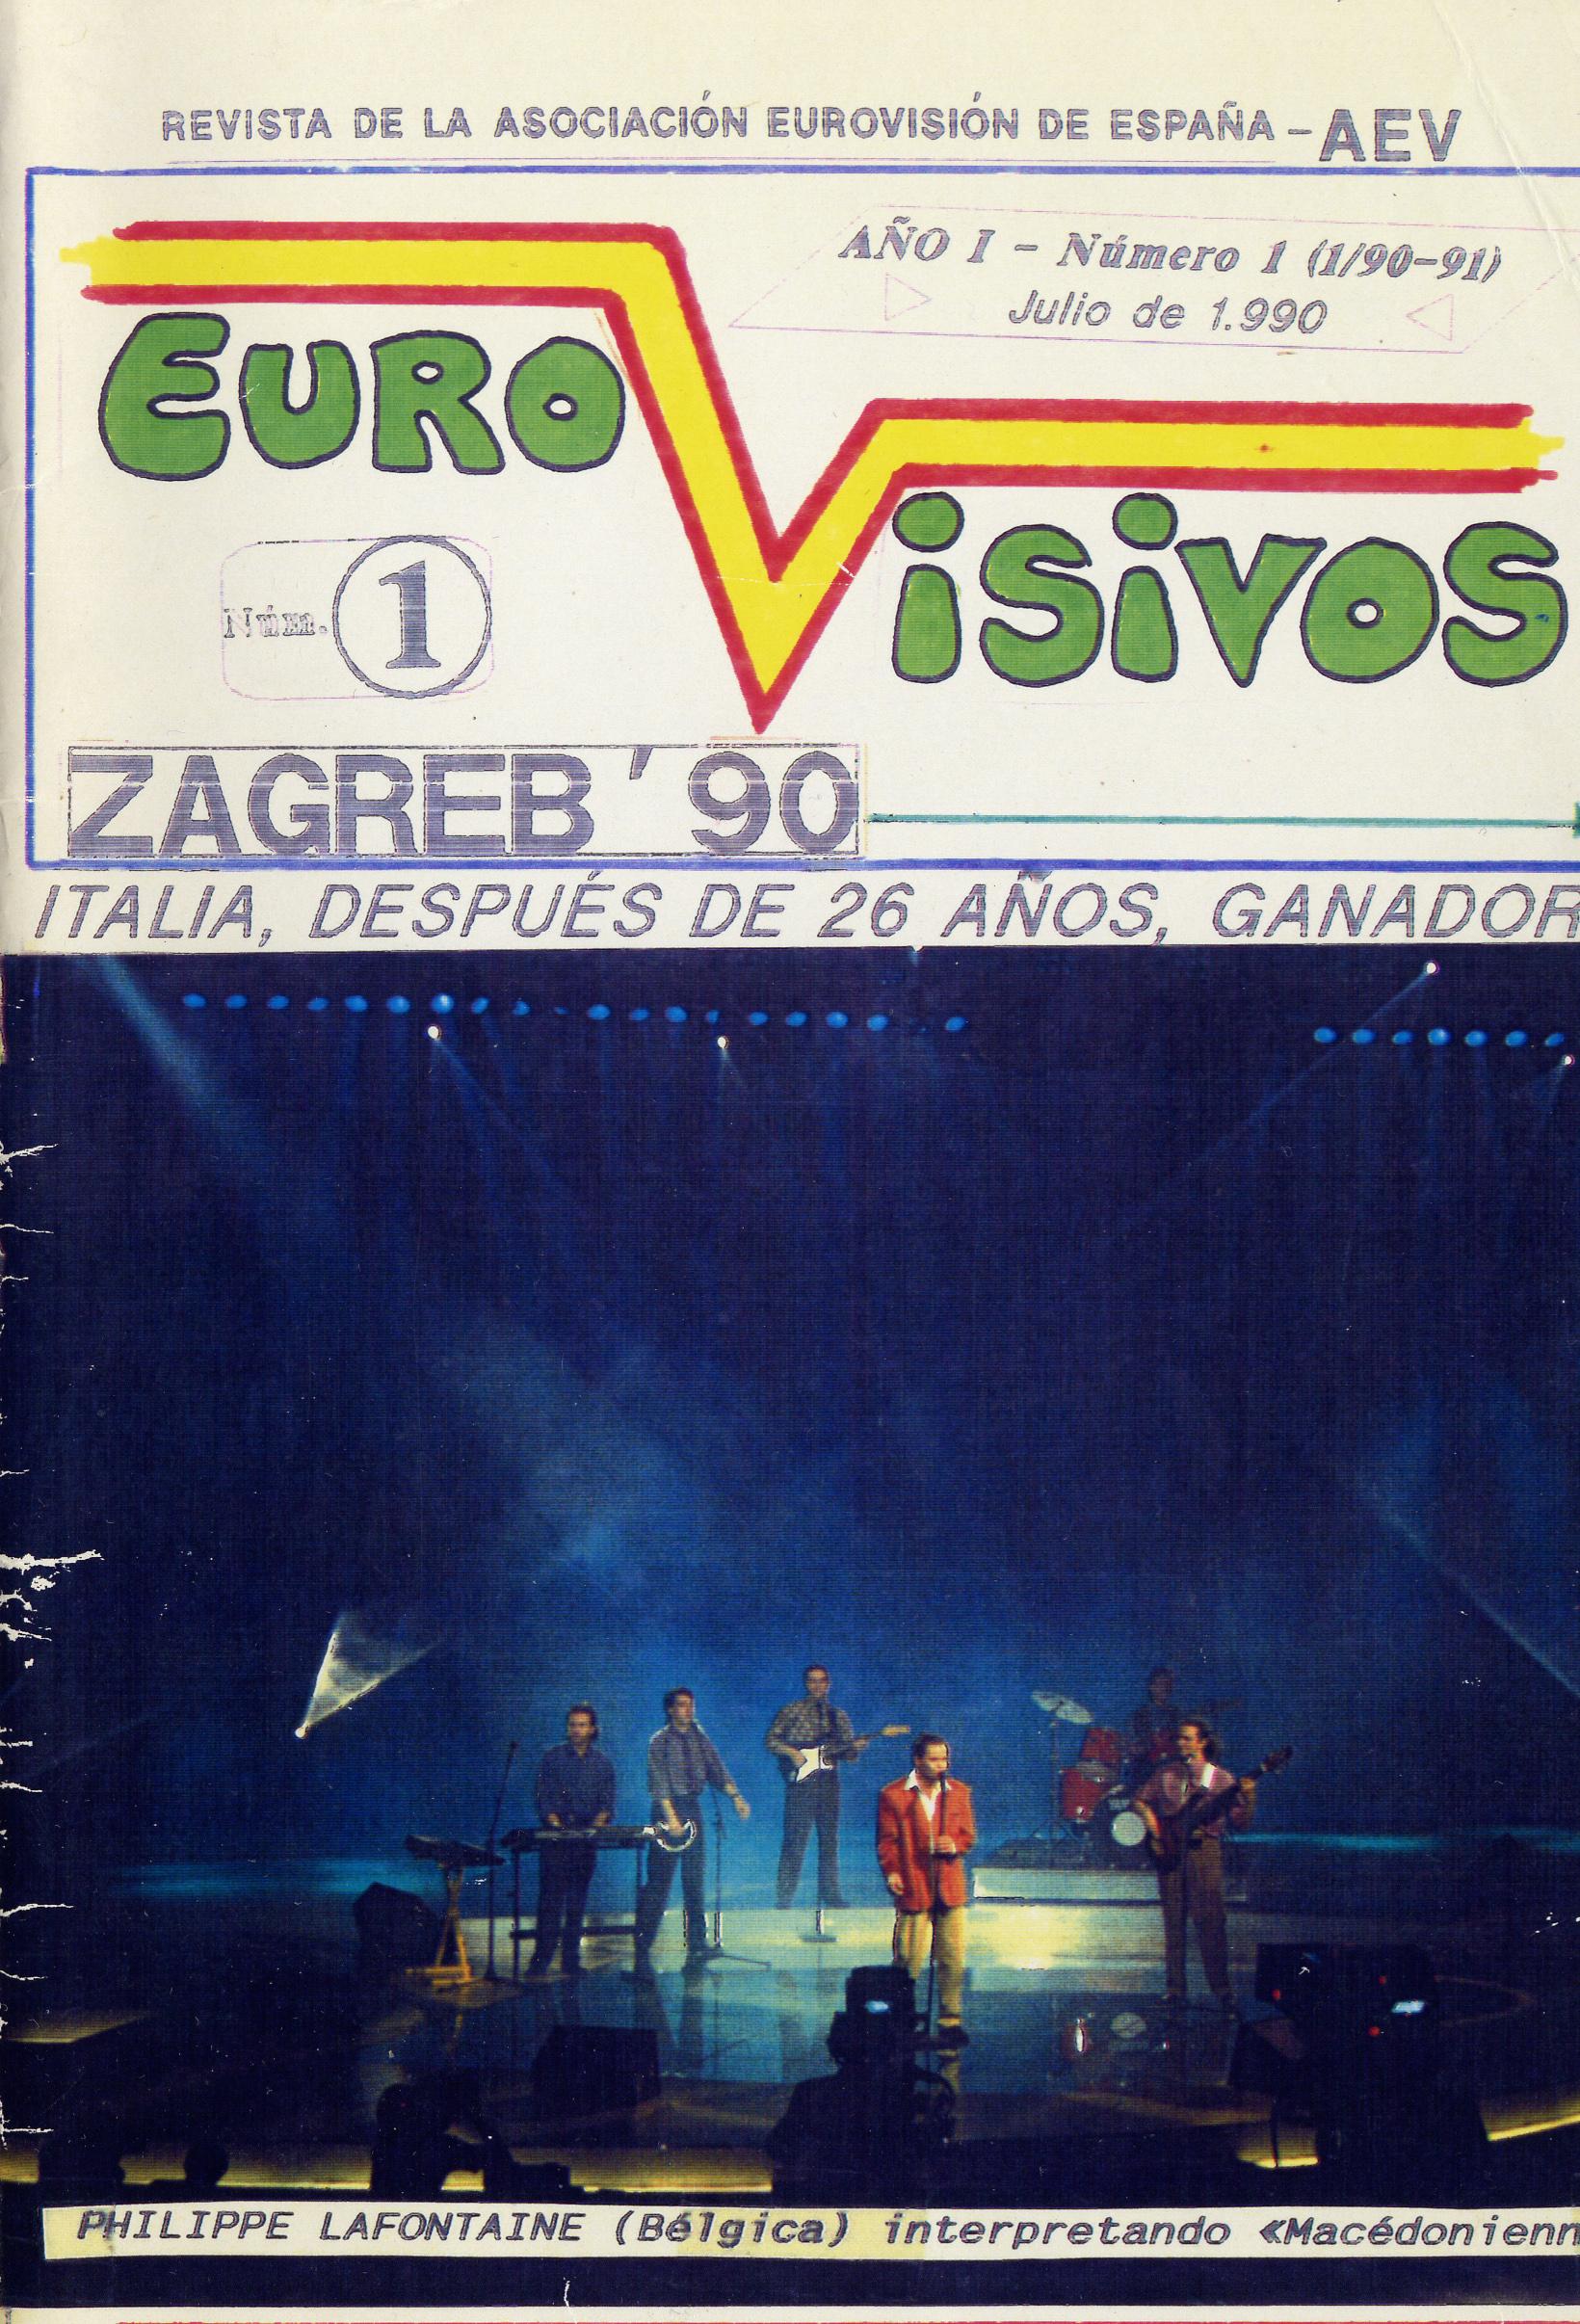 1990 eurovisivos